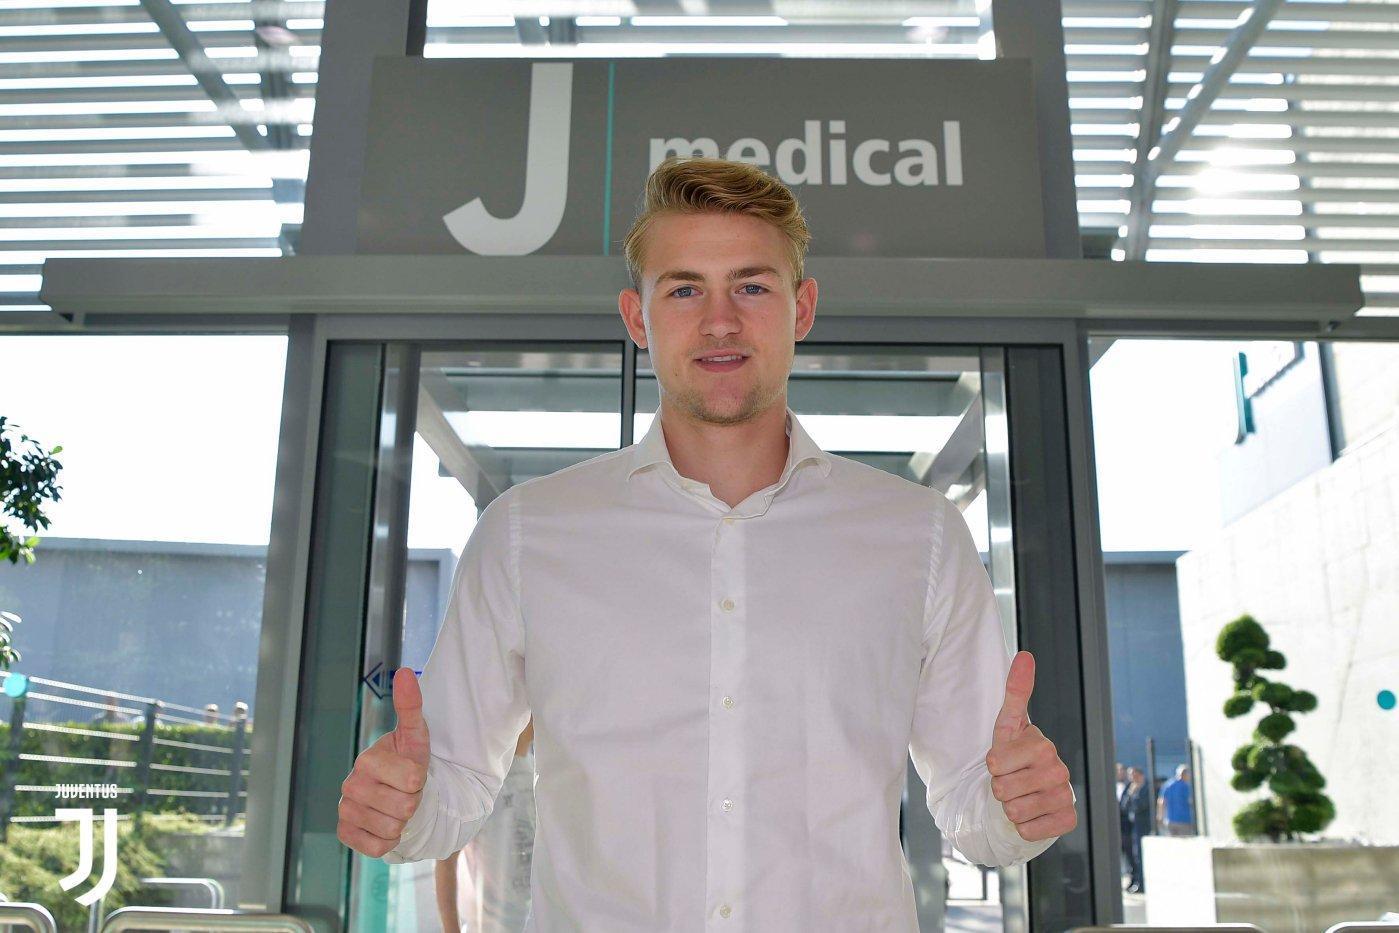 3 - Matthijs de Ligt alla Juventus (75 mln)